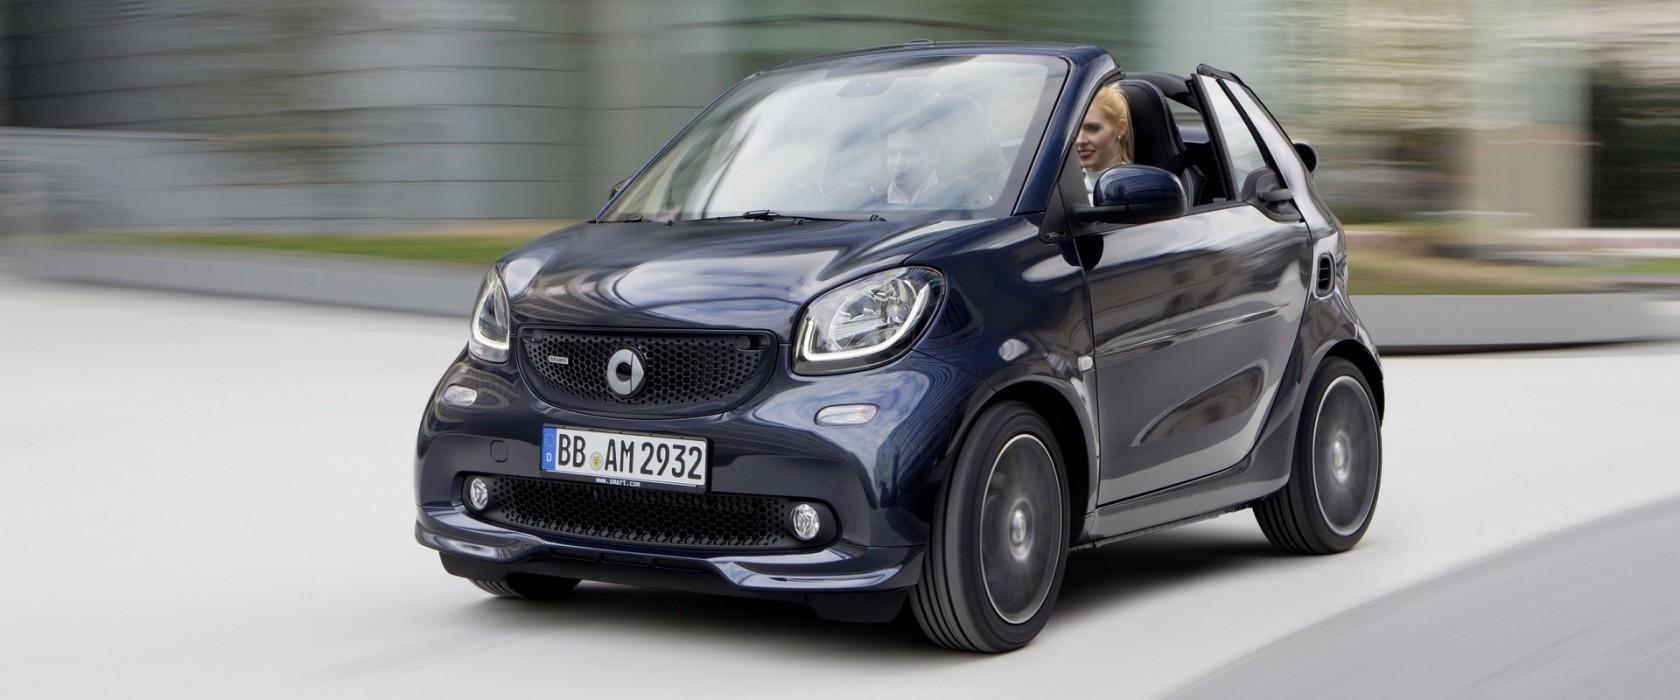 smart BRABUS cabrio Xclusive, 2016, tailor made dark blue shiny ;  smart BRABUS cabrio Xclusive, 2016, tailor made dark blue shiny;